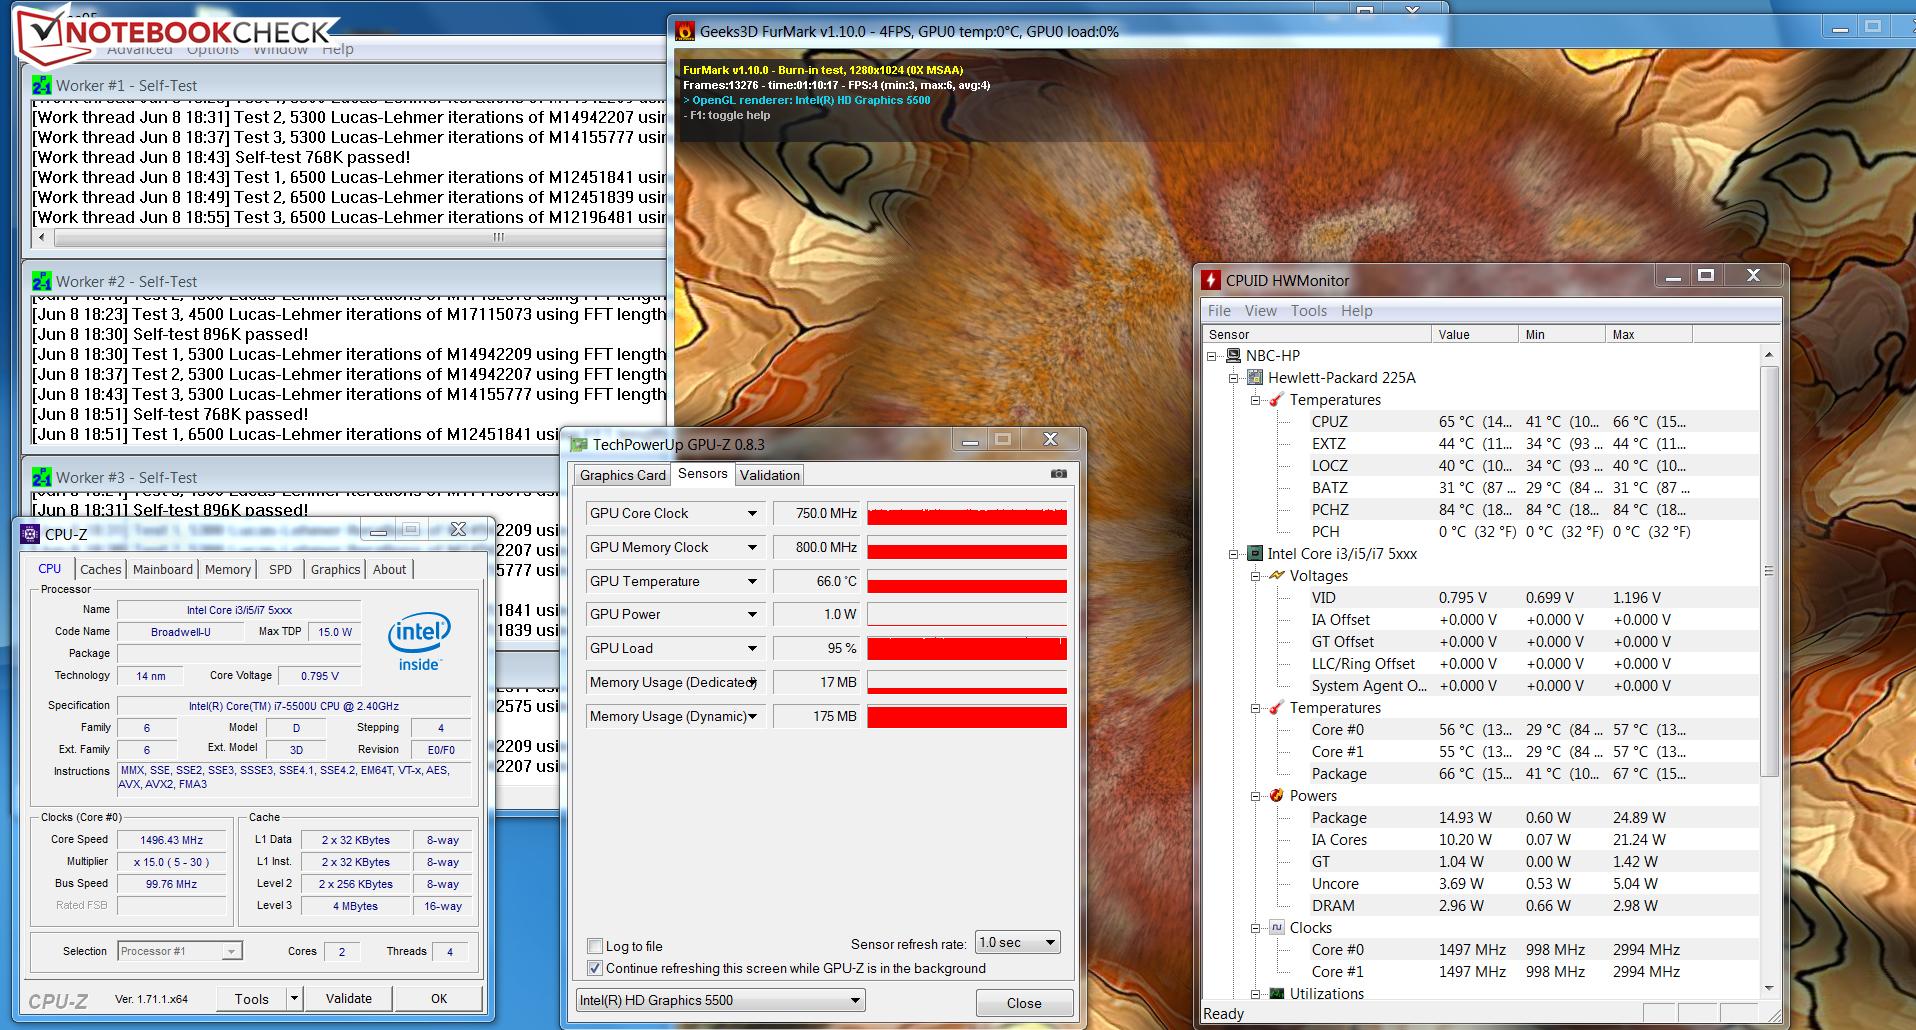 Face Off: HP EliteBook 820 G2 vs  Lenovo ThinkPad X250 vs  Dell